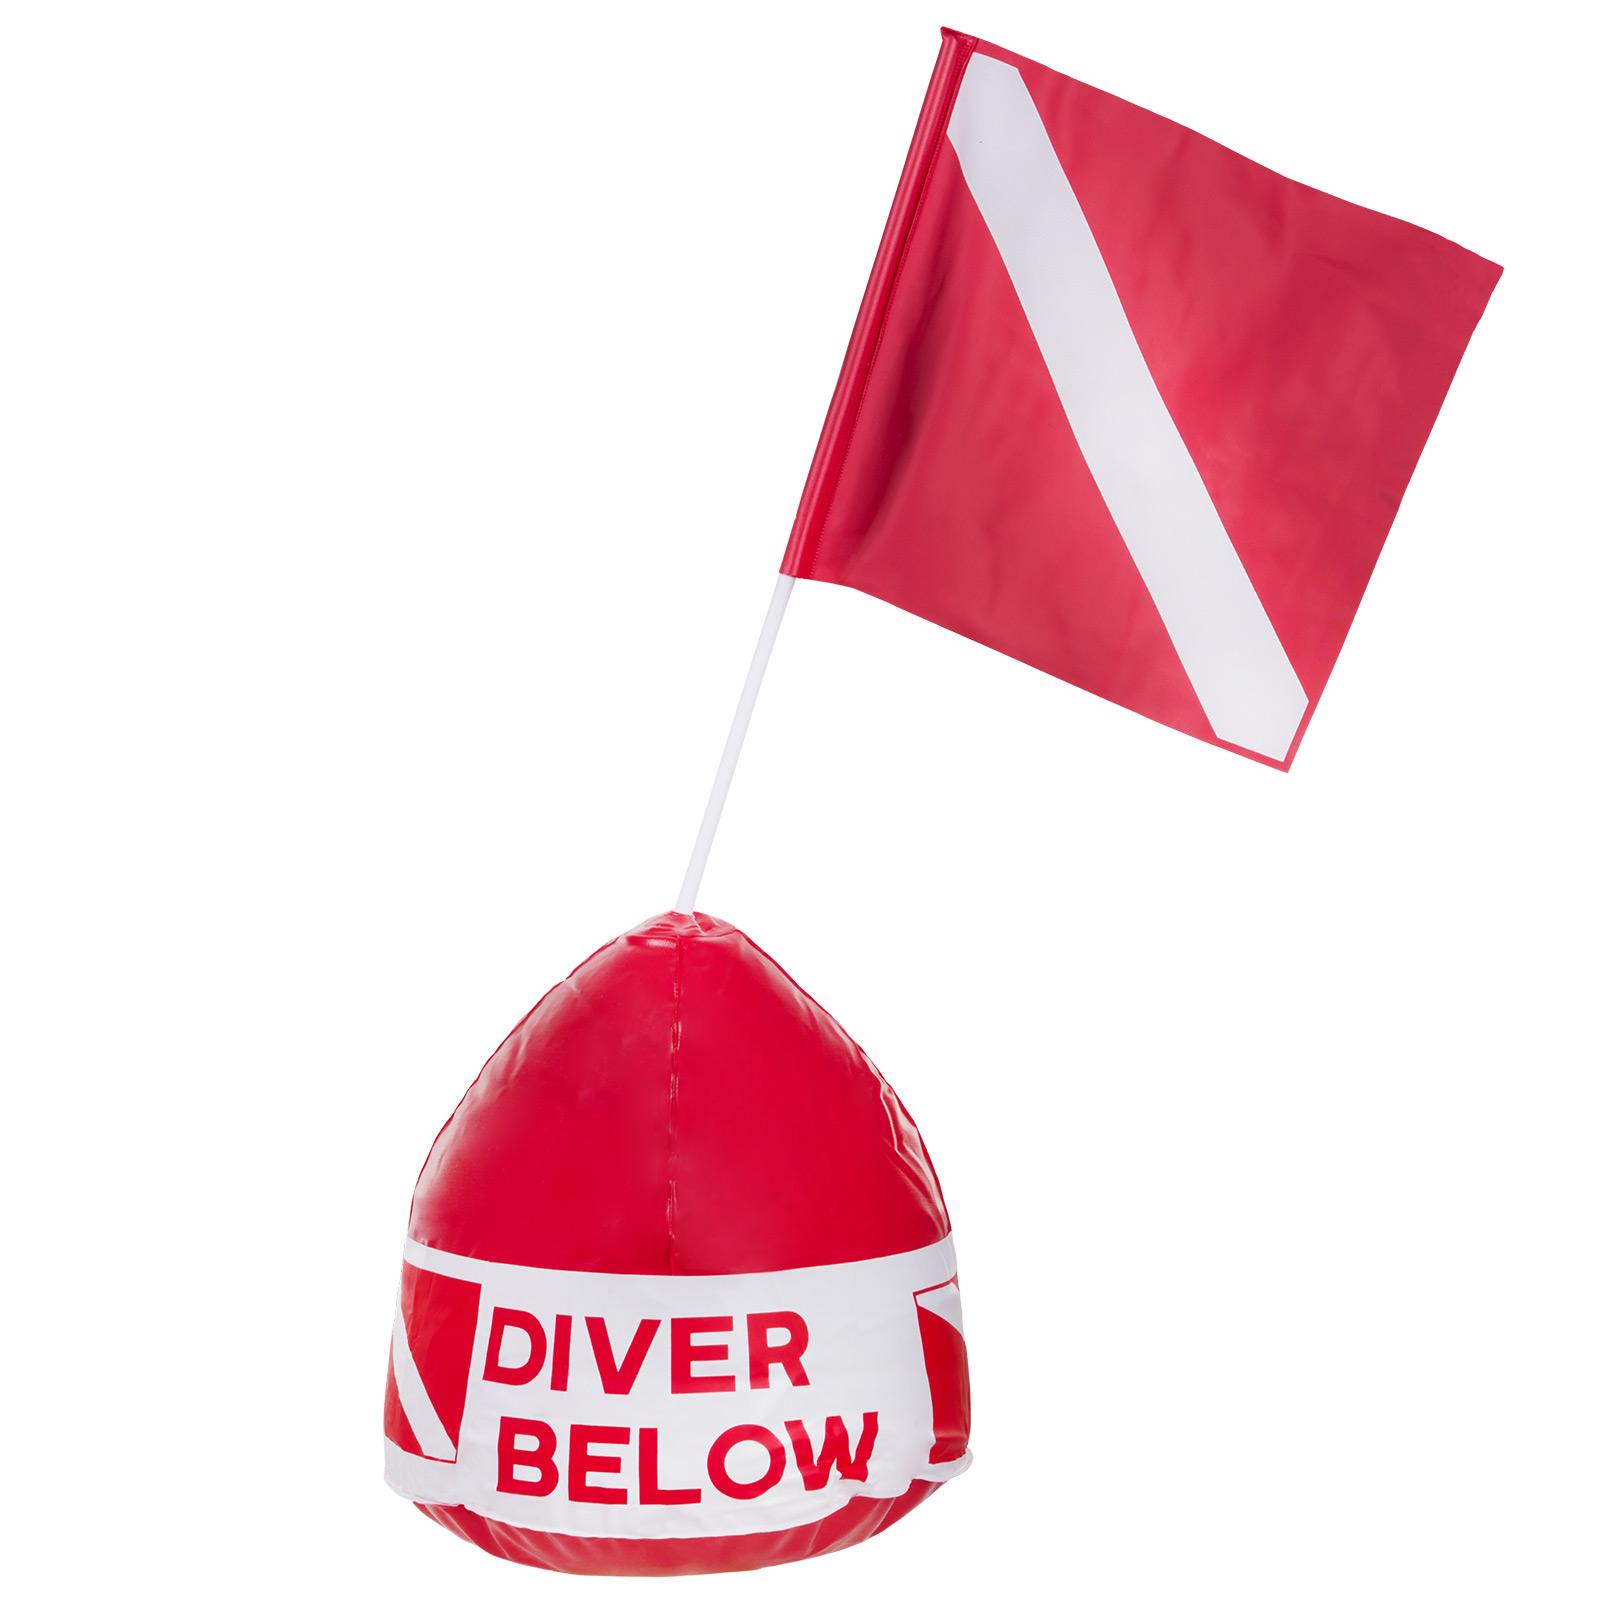 Diver Below Buoy